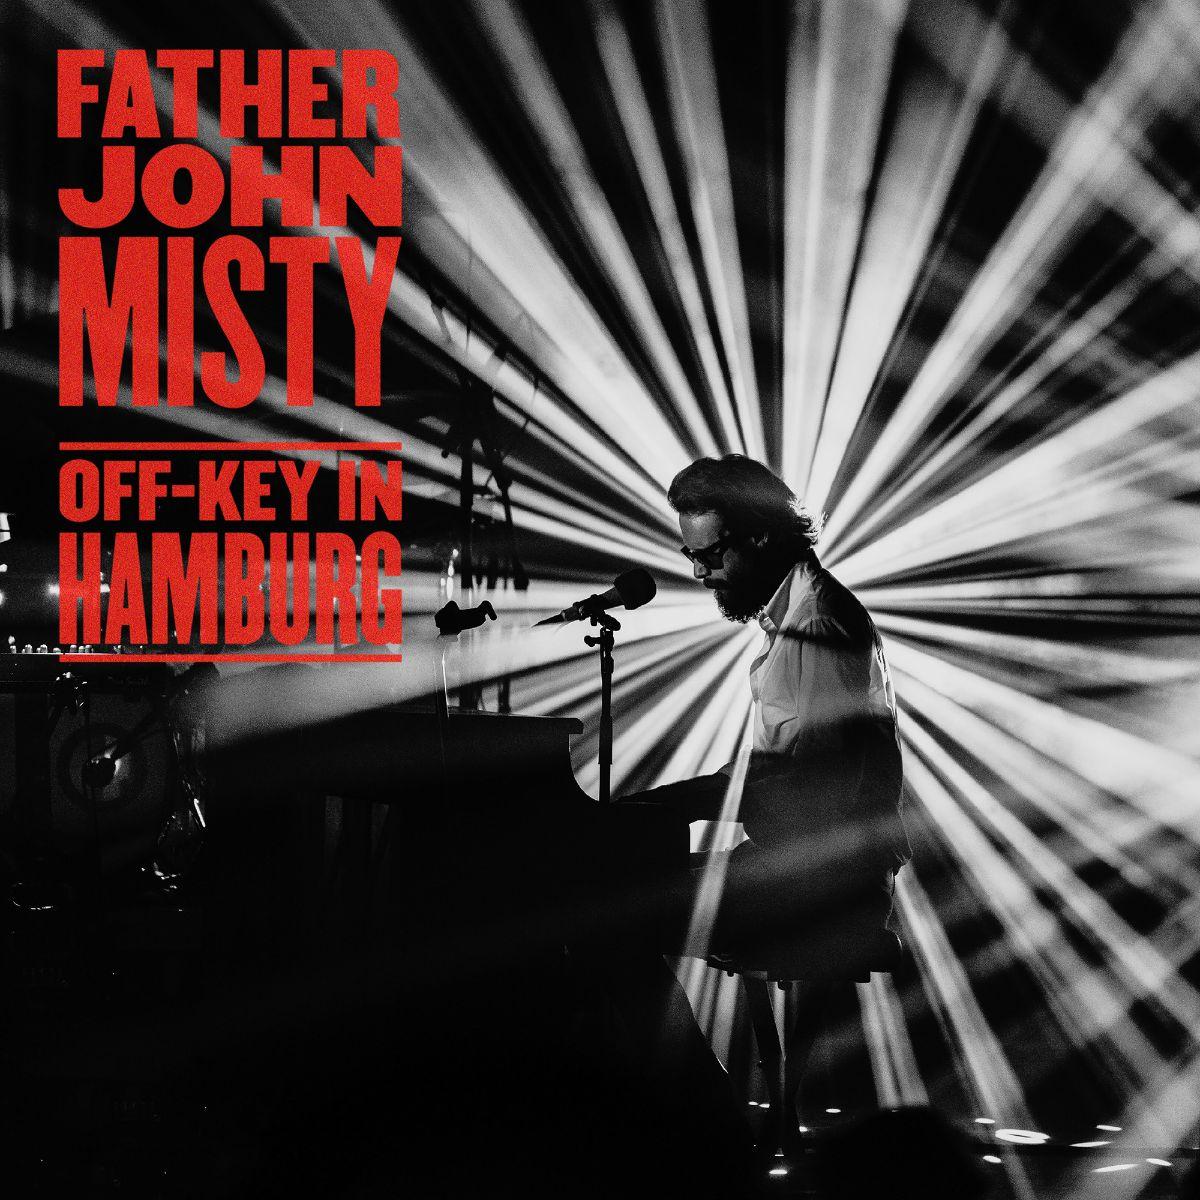 father john misty off-key in hamburg live album stream